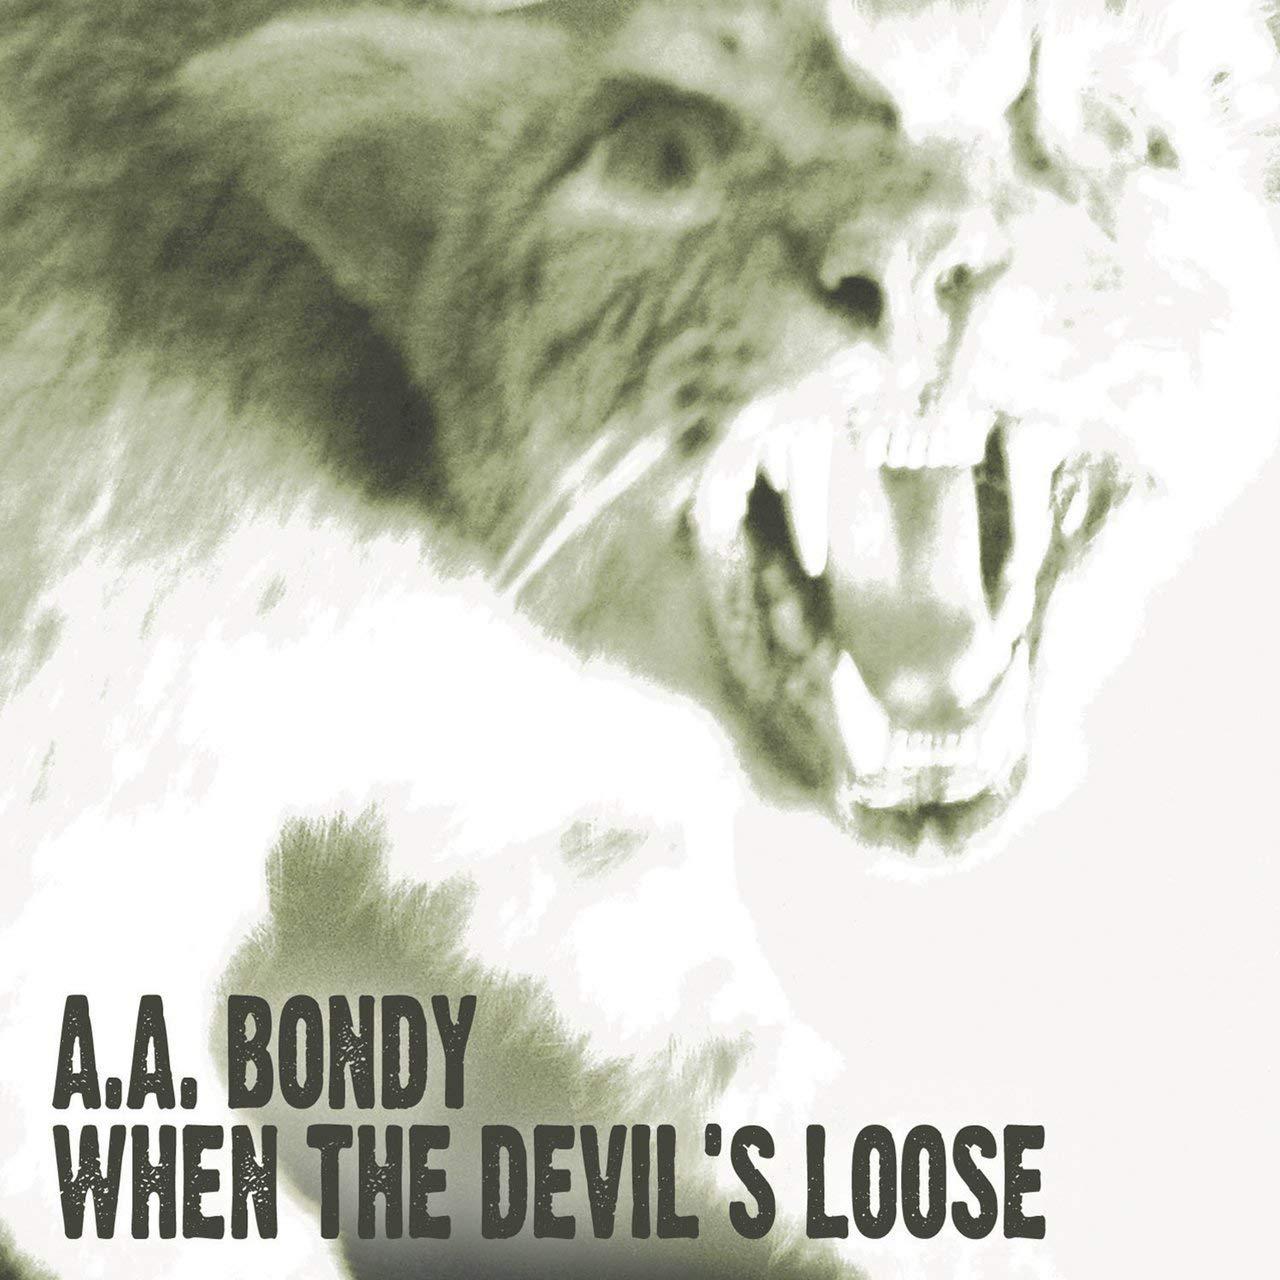 When the Devils Loose : A.A. Bondy: Amazon.es: Música